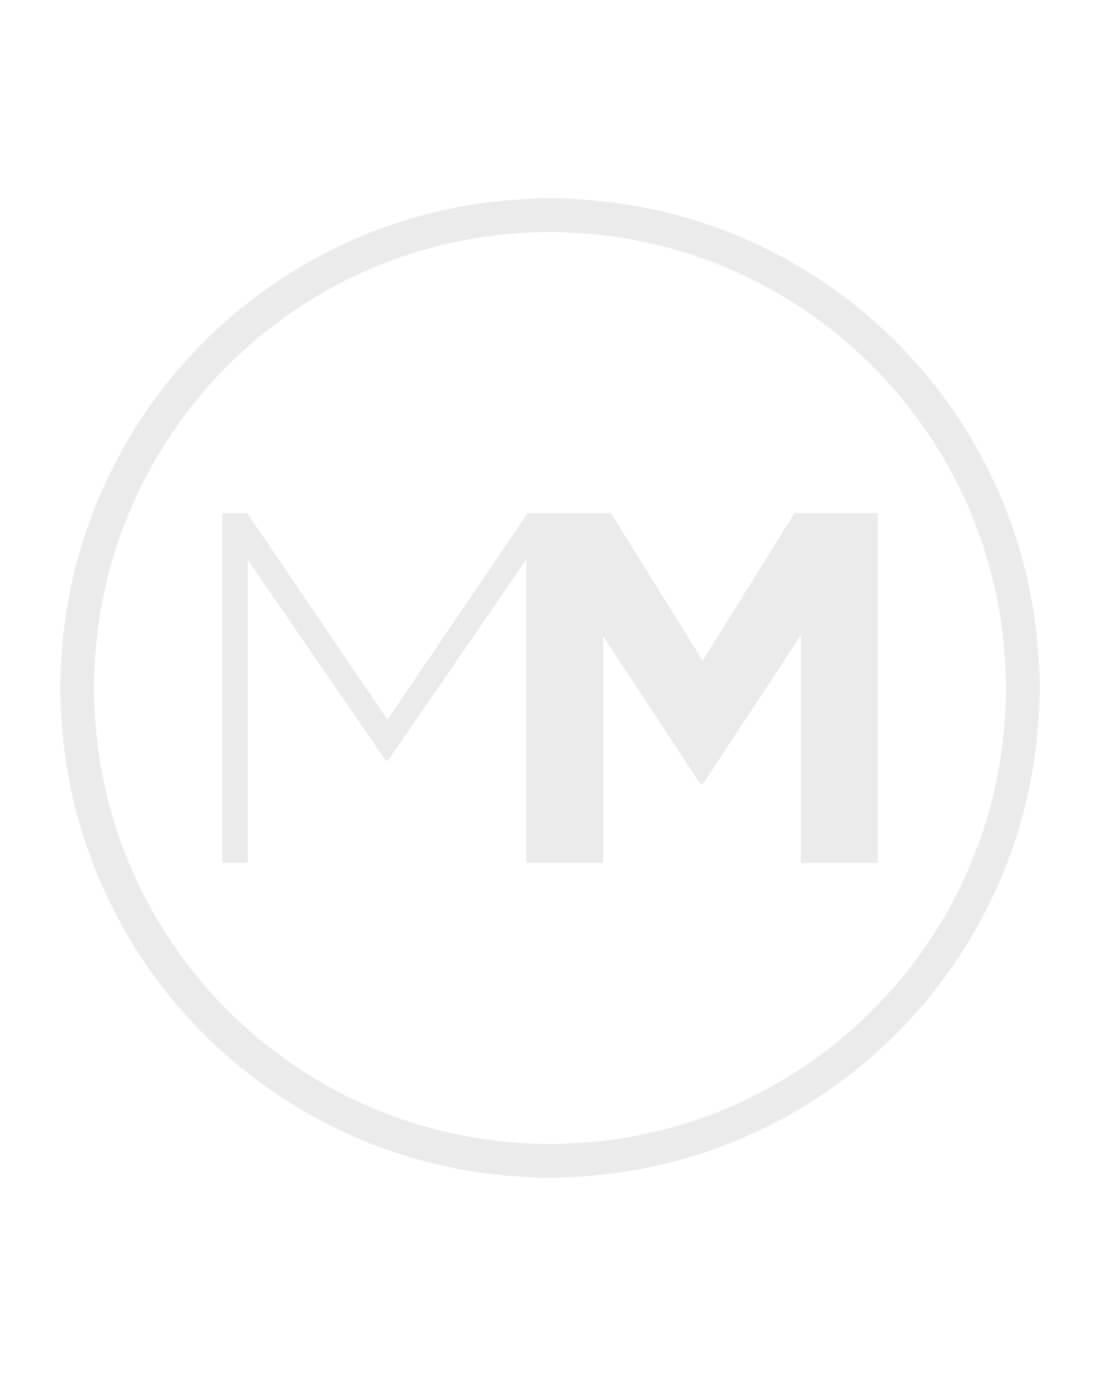 Kocca Kerloss jurk ecru dessin